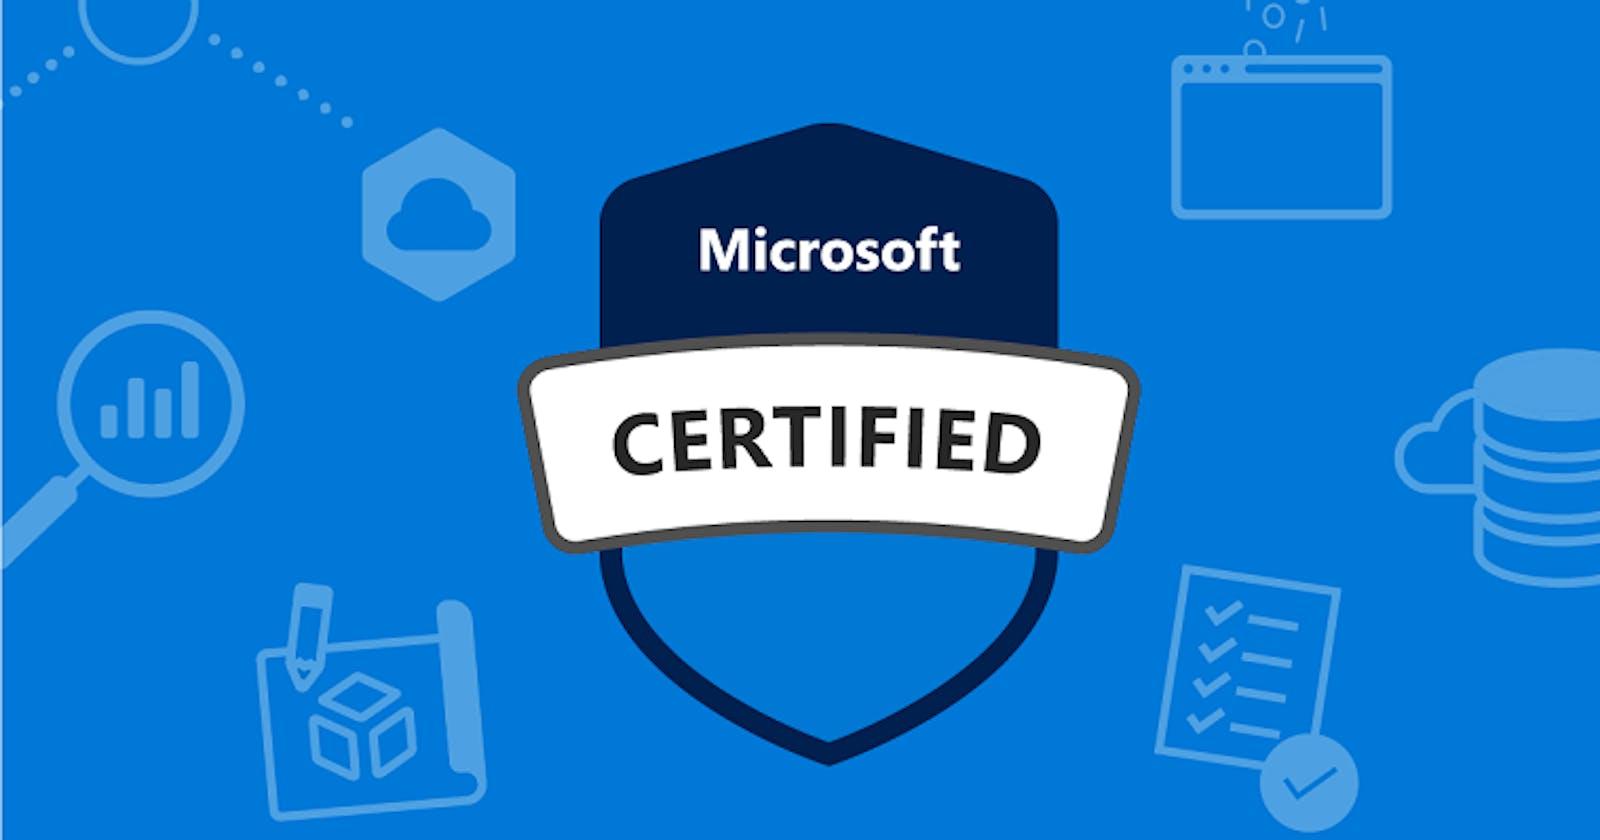 Azure DP-900 Short Notes: Explore relational data services in Azure